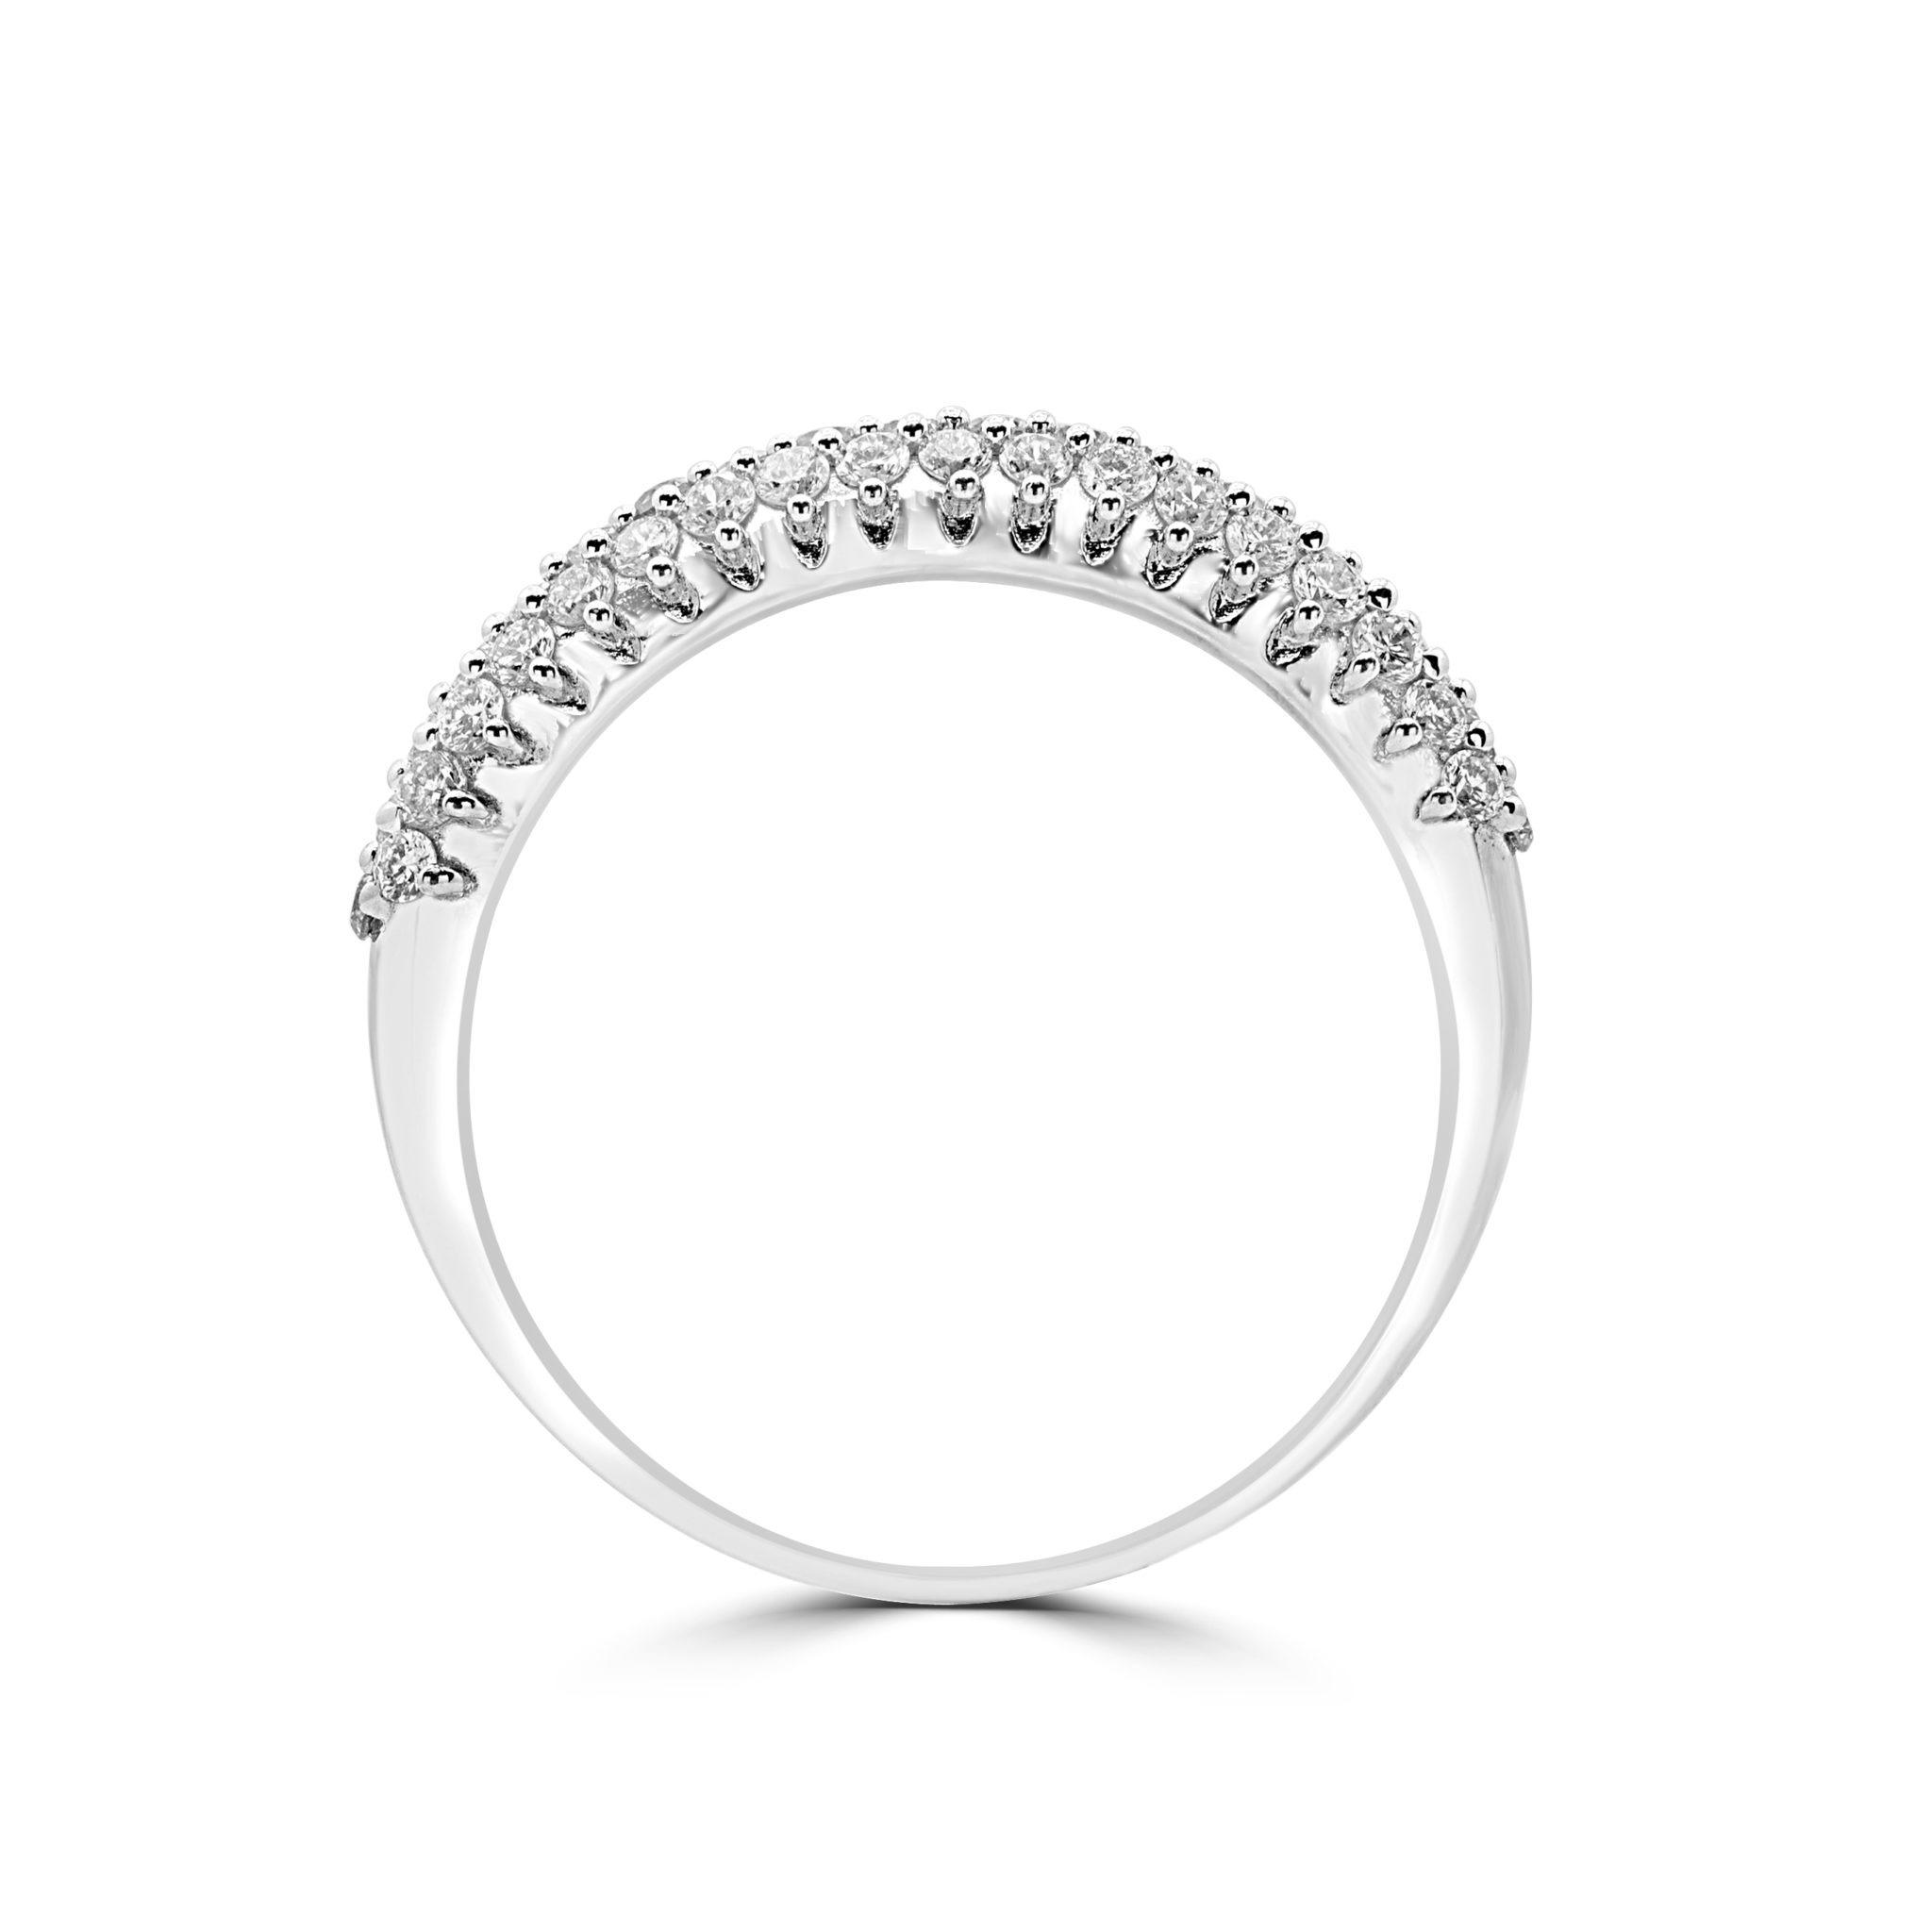 Sparkly Diamond Ring 0 58 Ctw In 14k White Gold